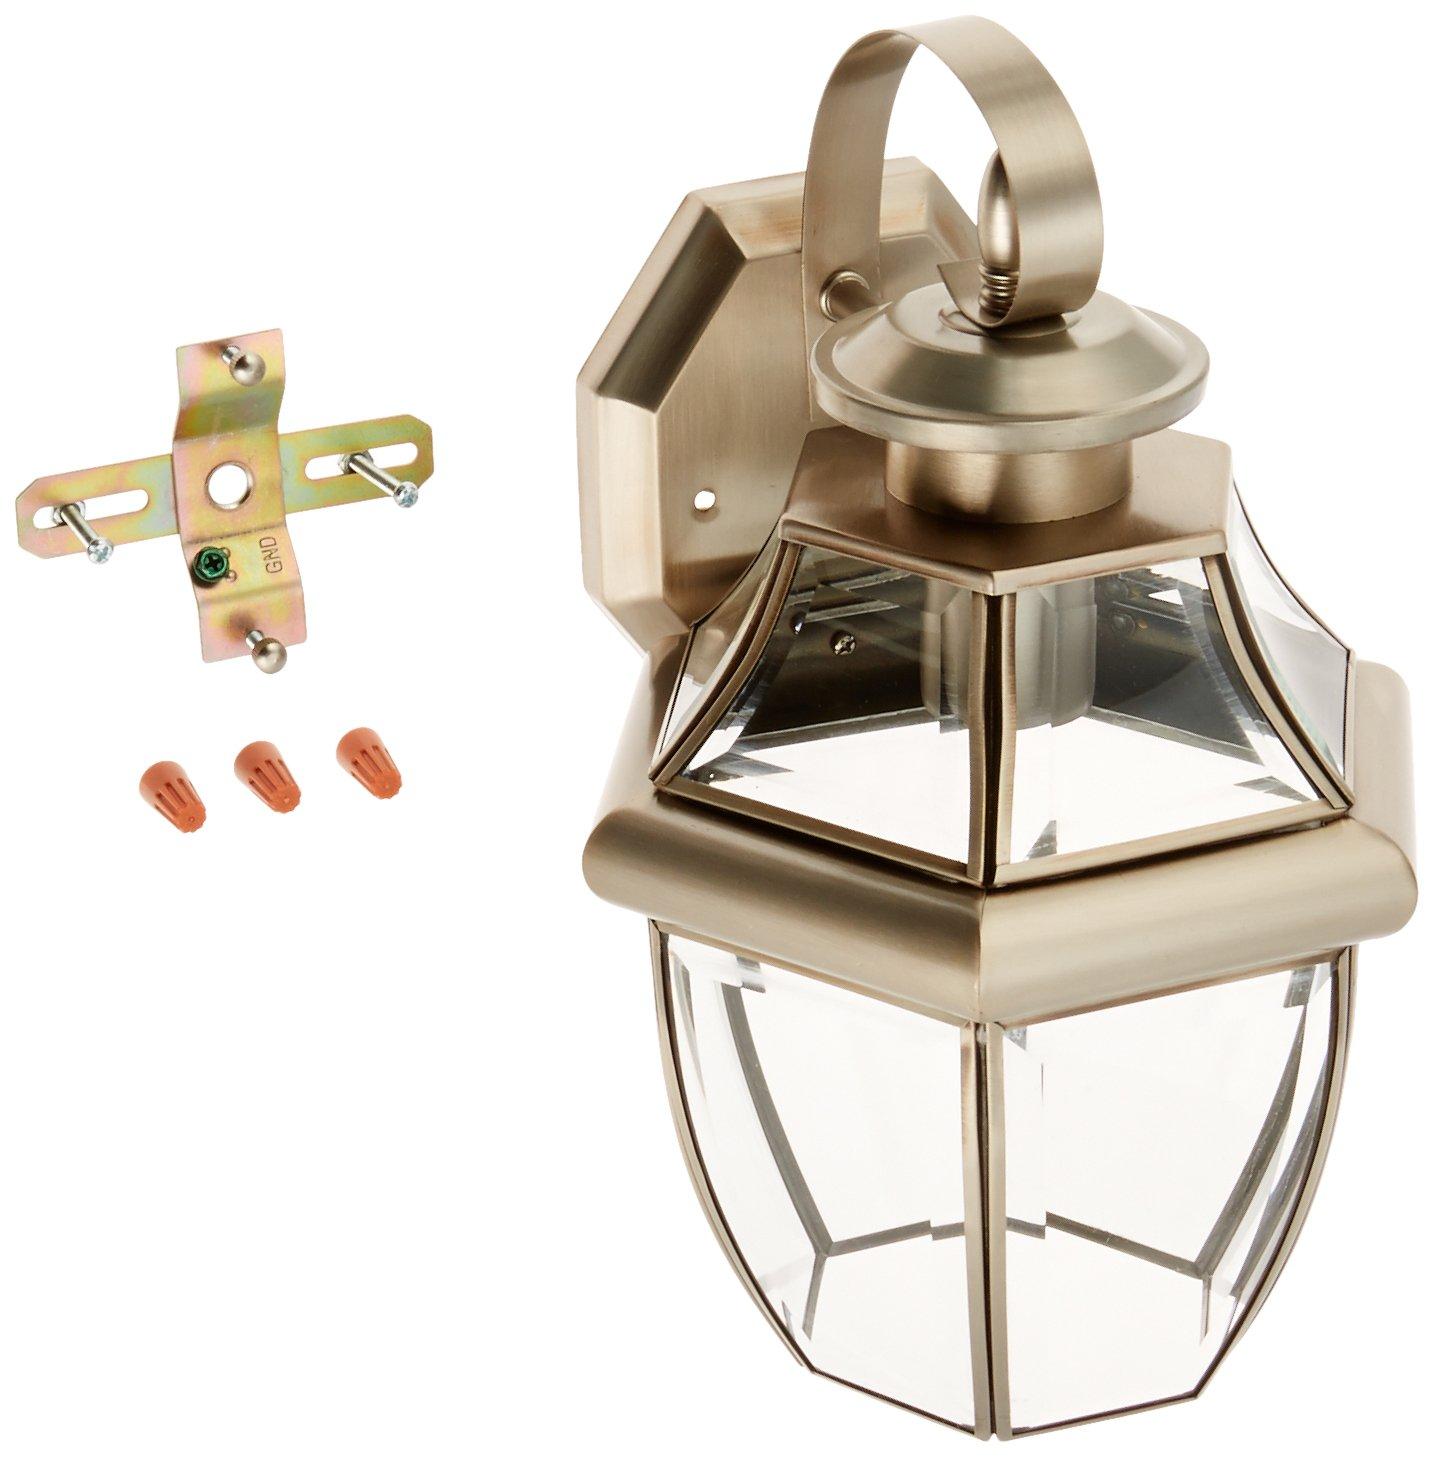 Trans Globe Lighting 4310 BN Outdoor Courtyard 13'' Wall Lantern, Brushed Nickel by Trans Globe Lighting